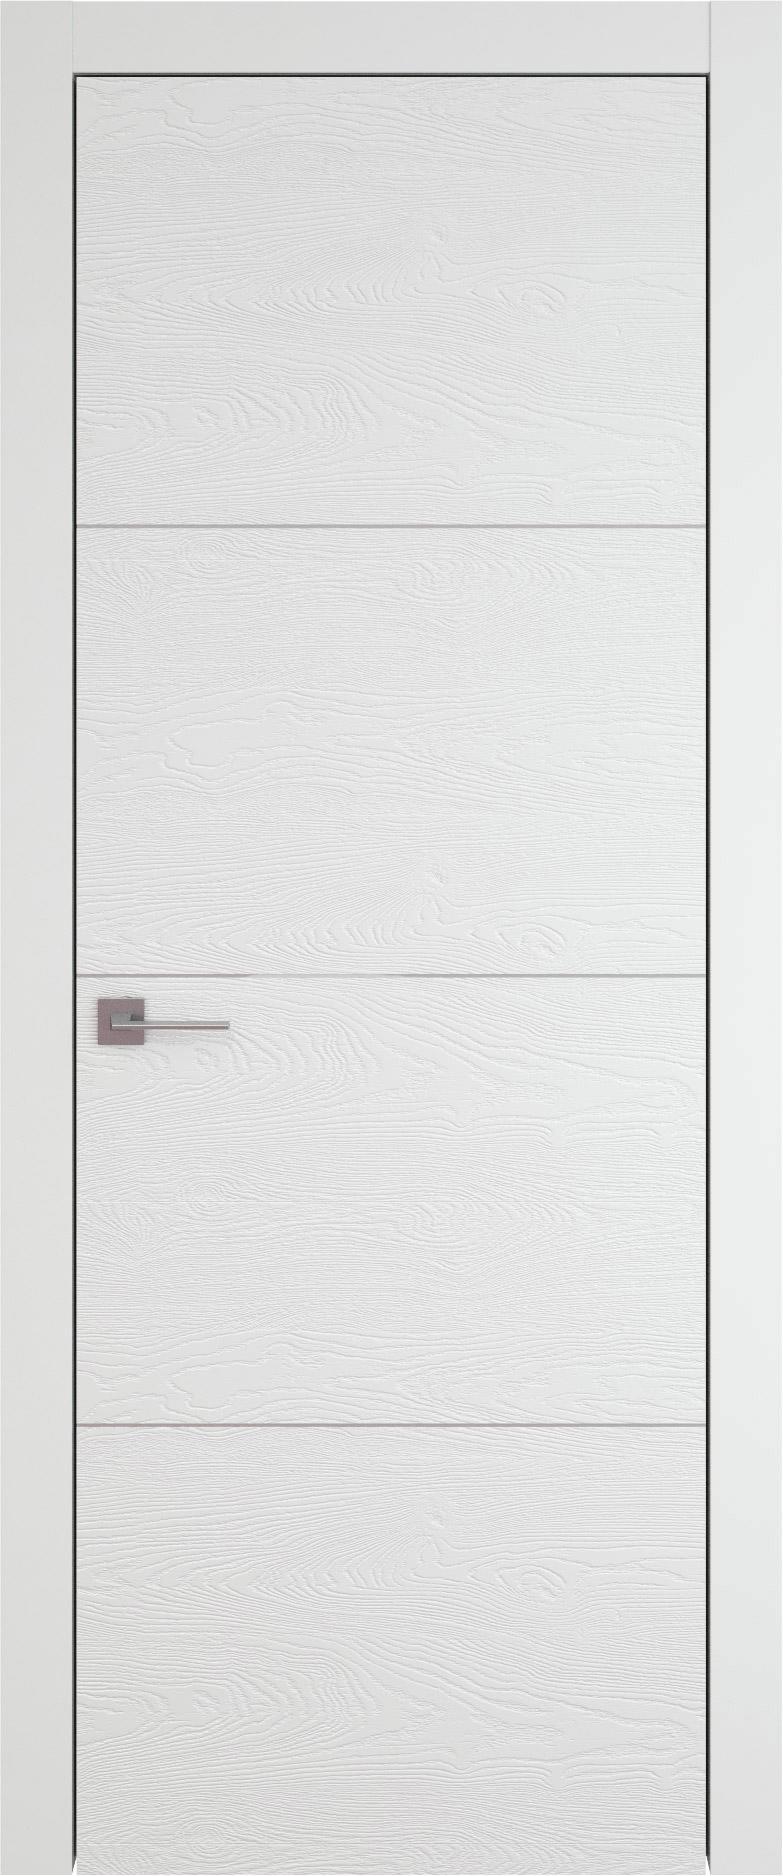 Tivoli Г-2 цвет - Белая эмаль по шпону (RAL 9003) Без стекла (ДГ)